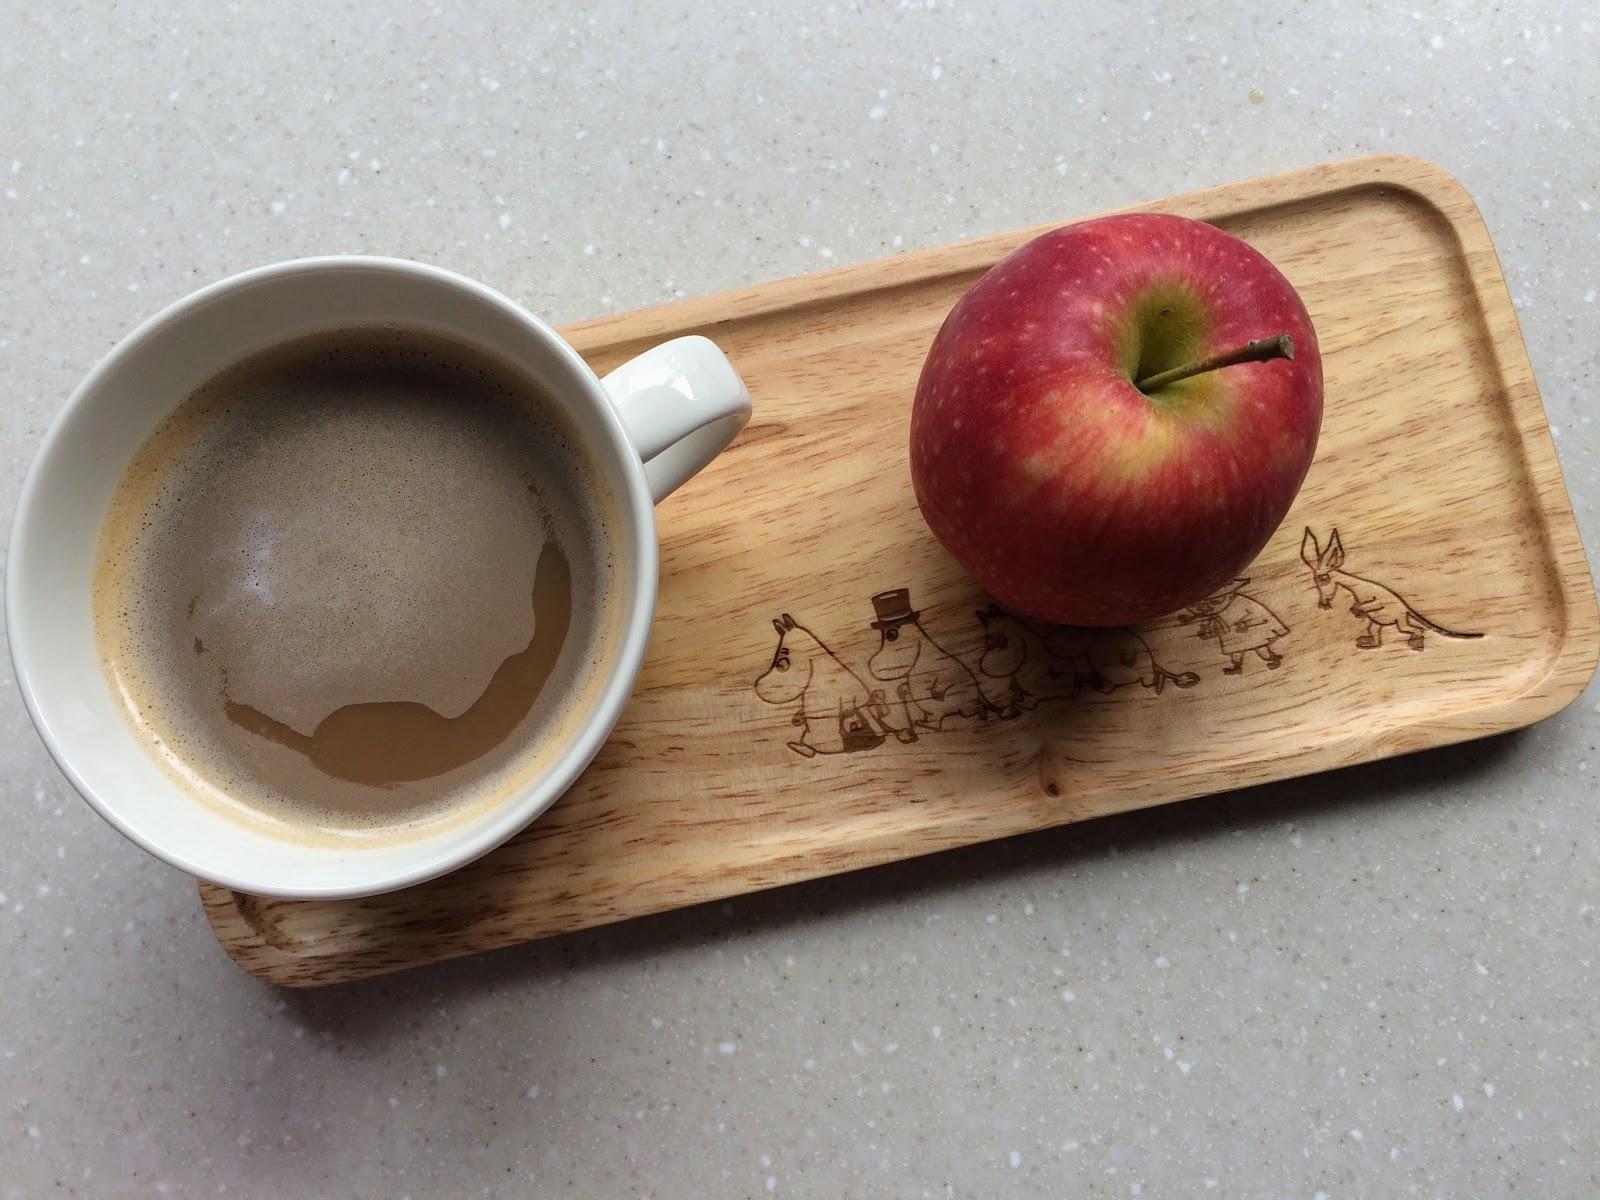 coffee and apple on moomin tray